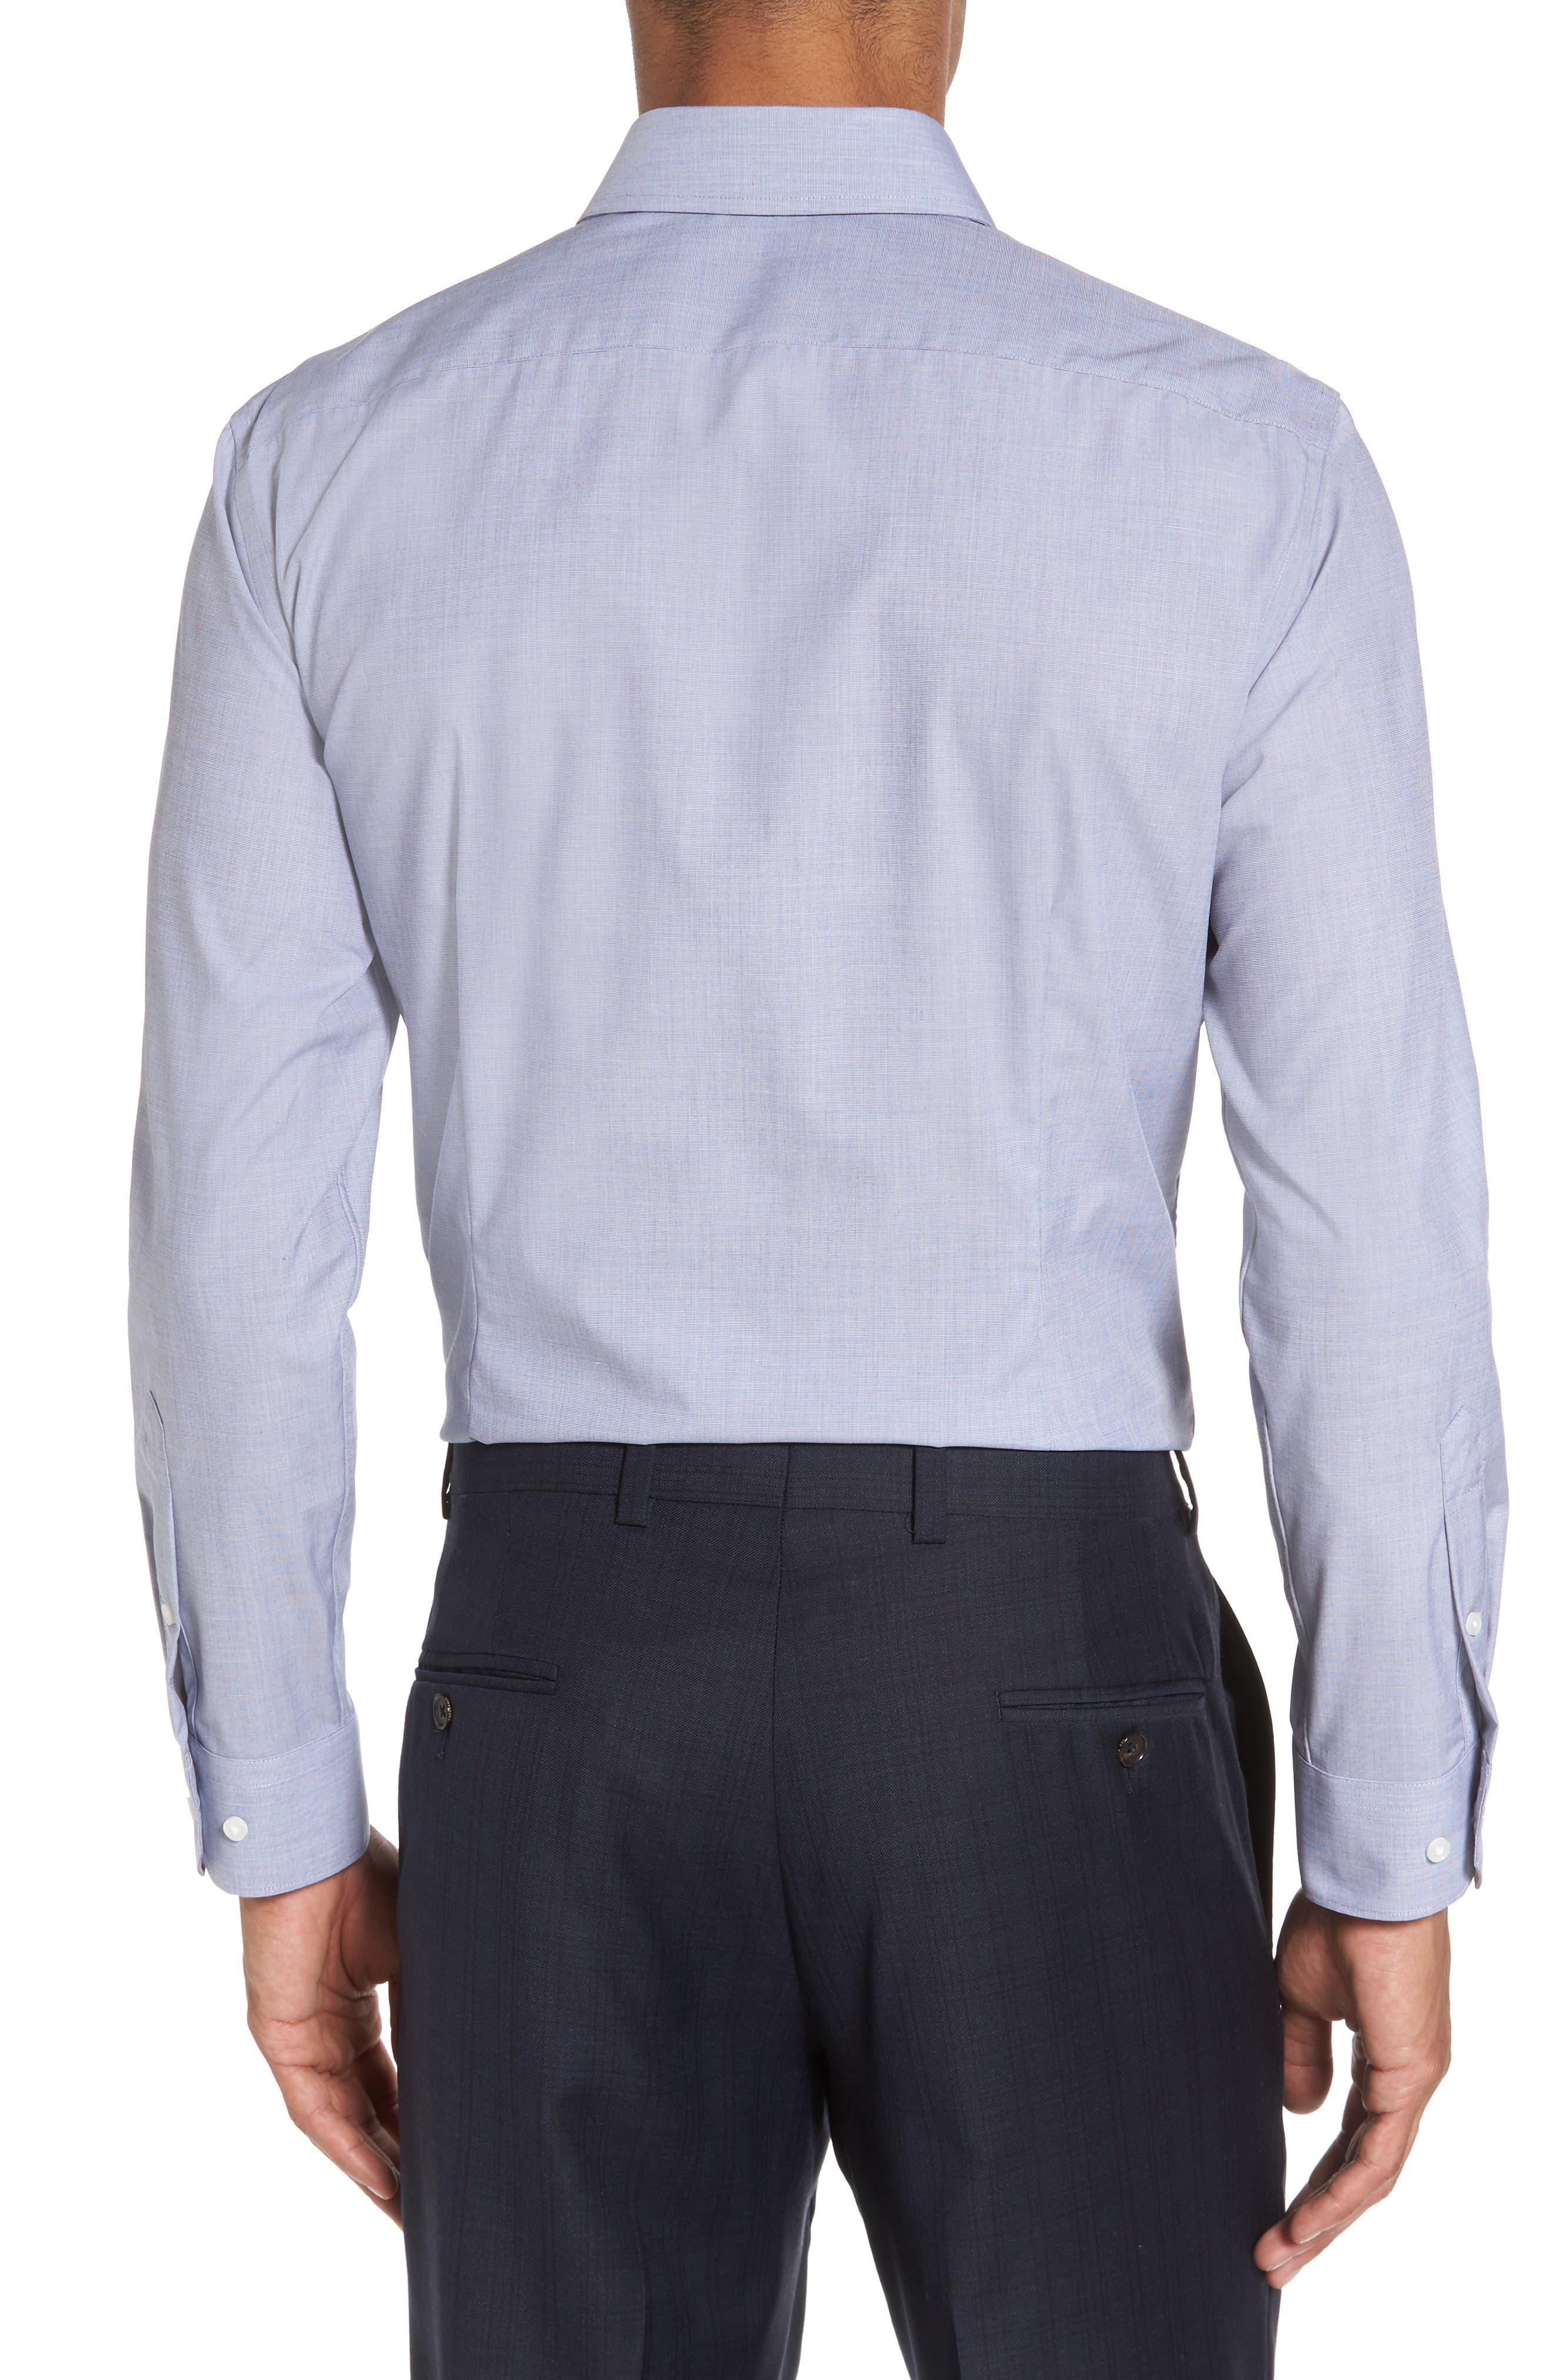 Extra Trim Fit Stretch No-Iron Dress Shirt,                             Alternate thumbnail 2, color,                             401